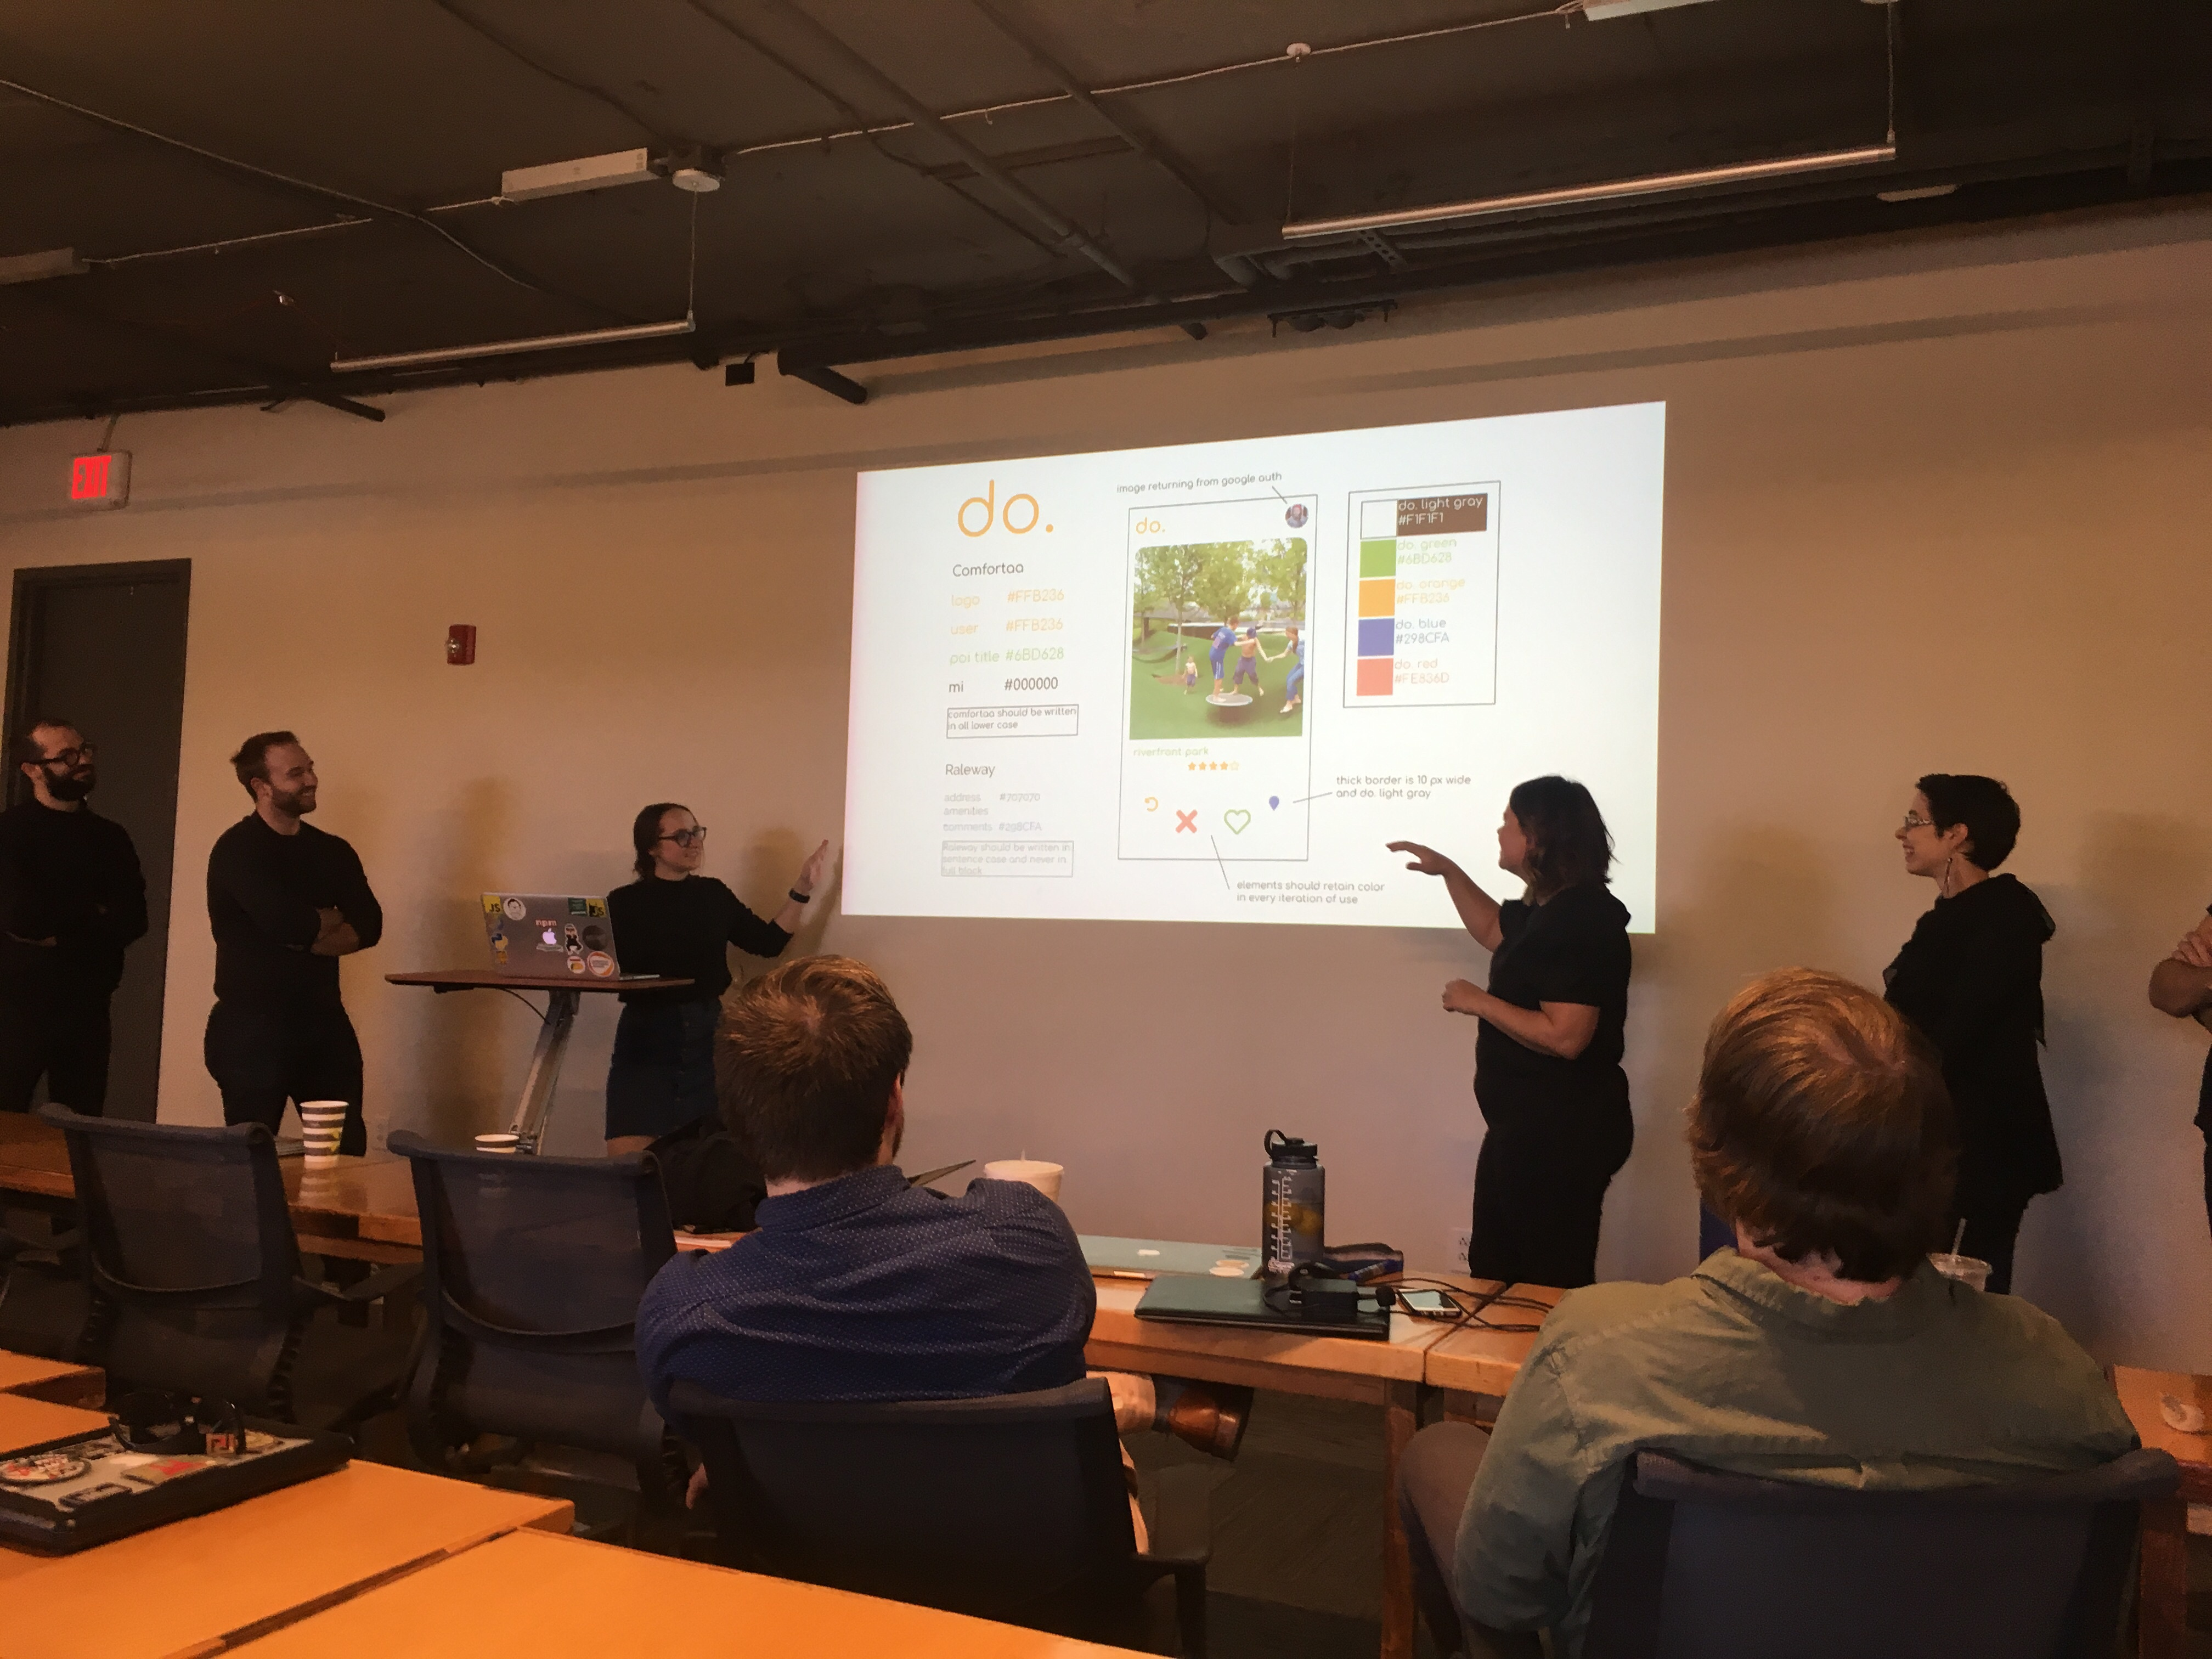 Team do. presenting